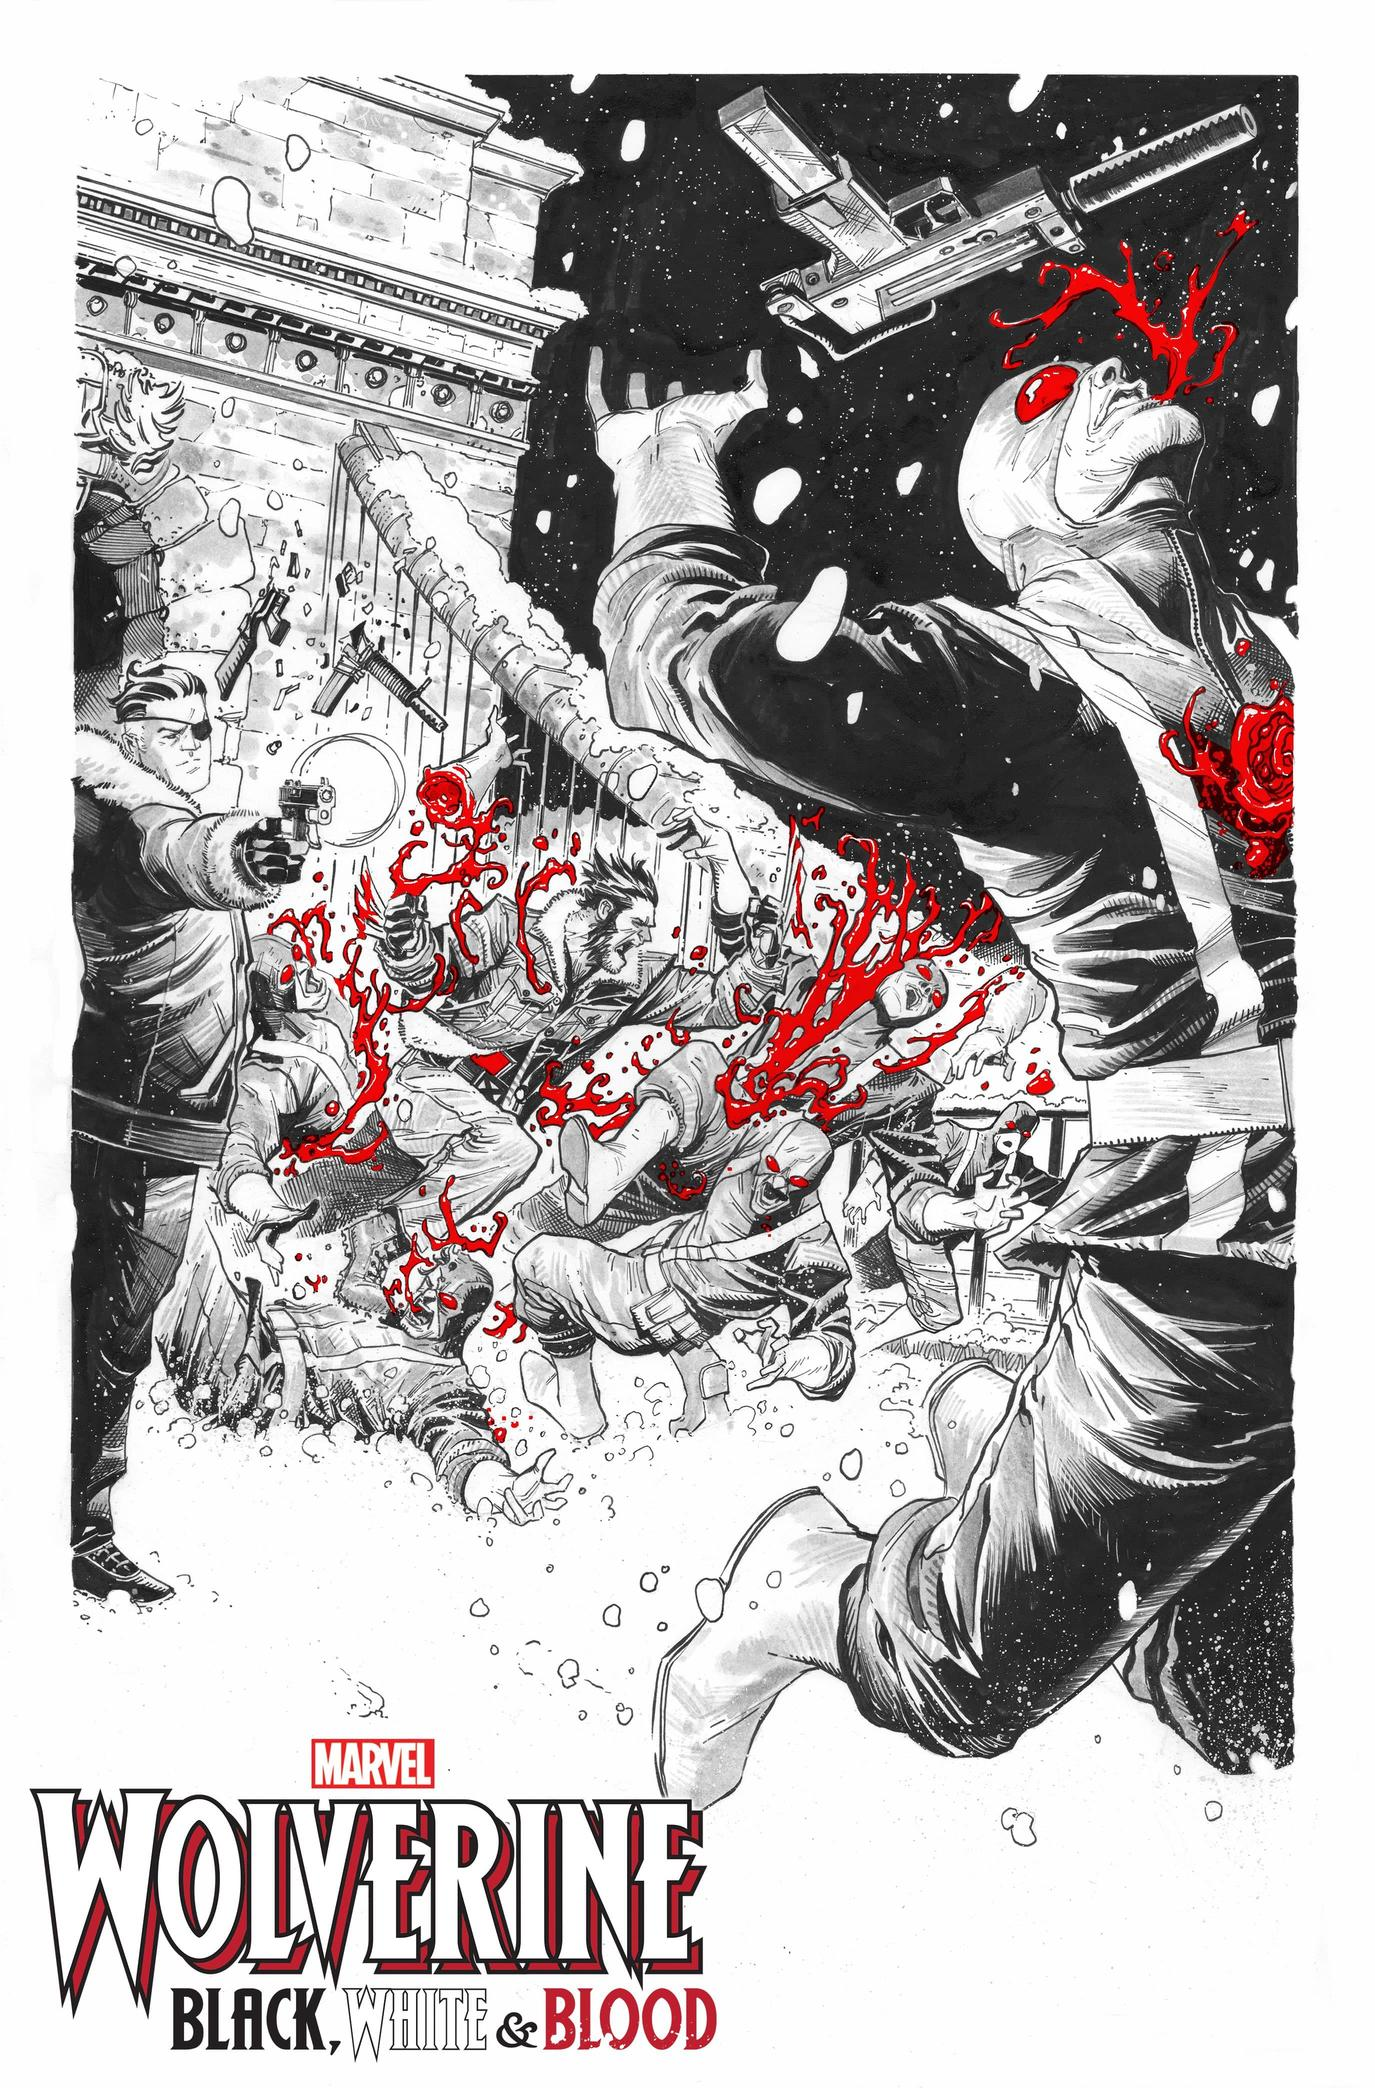 WOLVERINE: BLACK, WHITE & BLOOD #1 preview interiors by Joshua Casssara and GURU-EFX